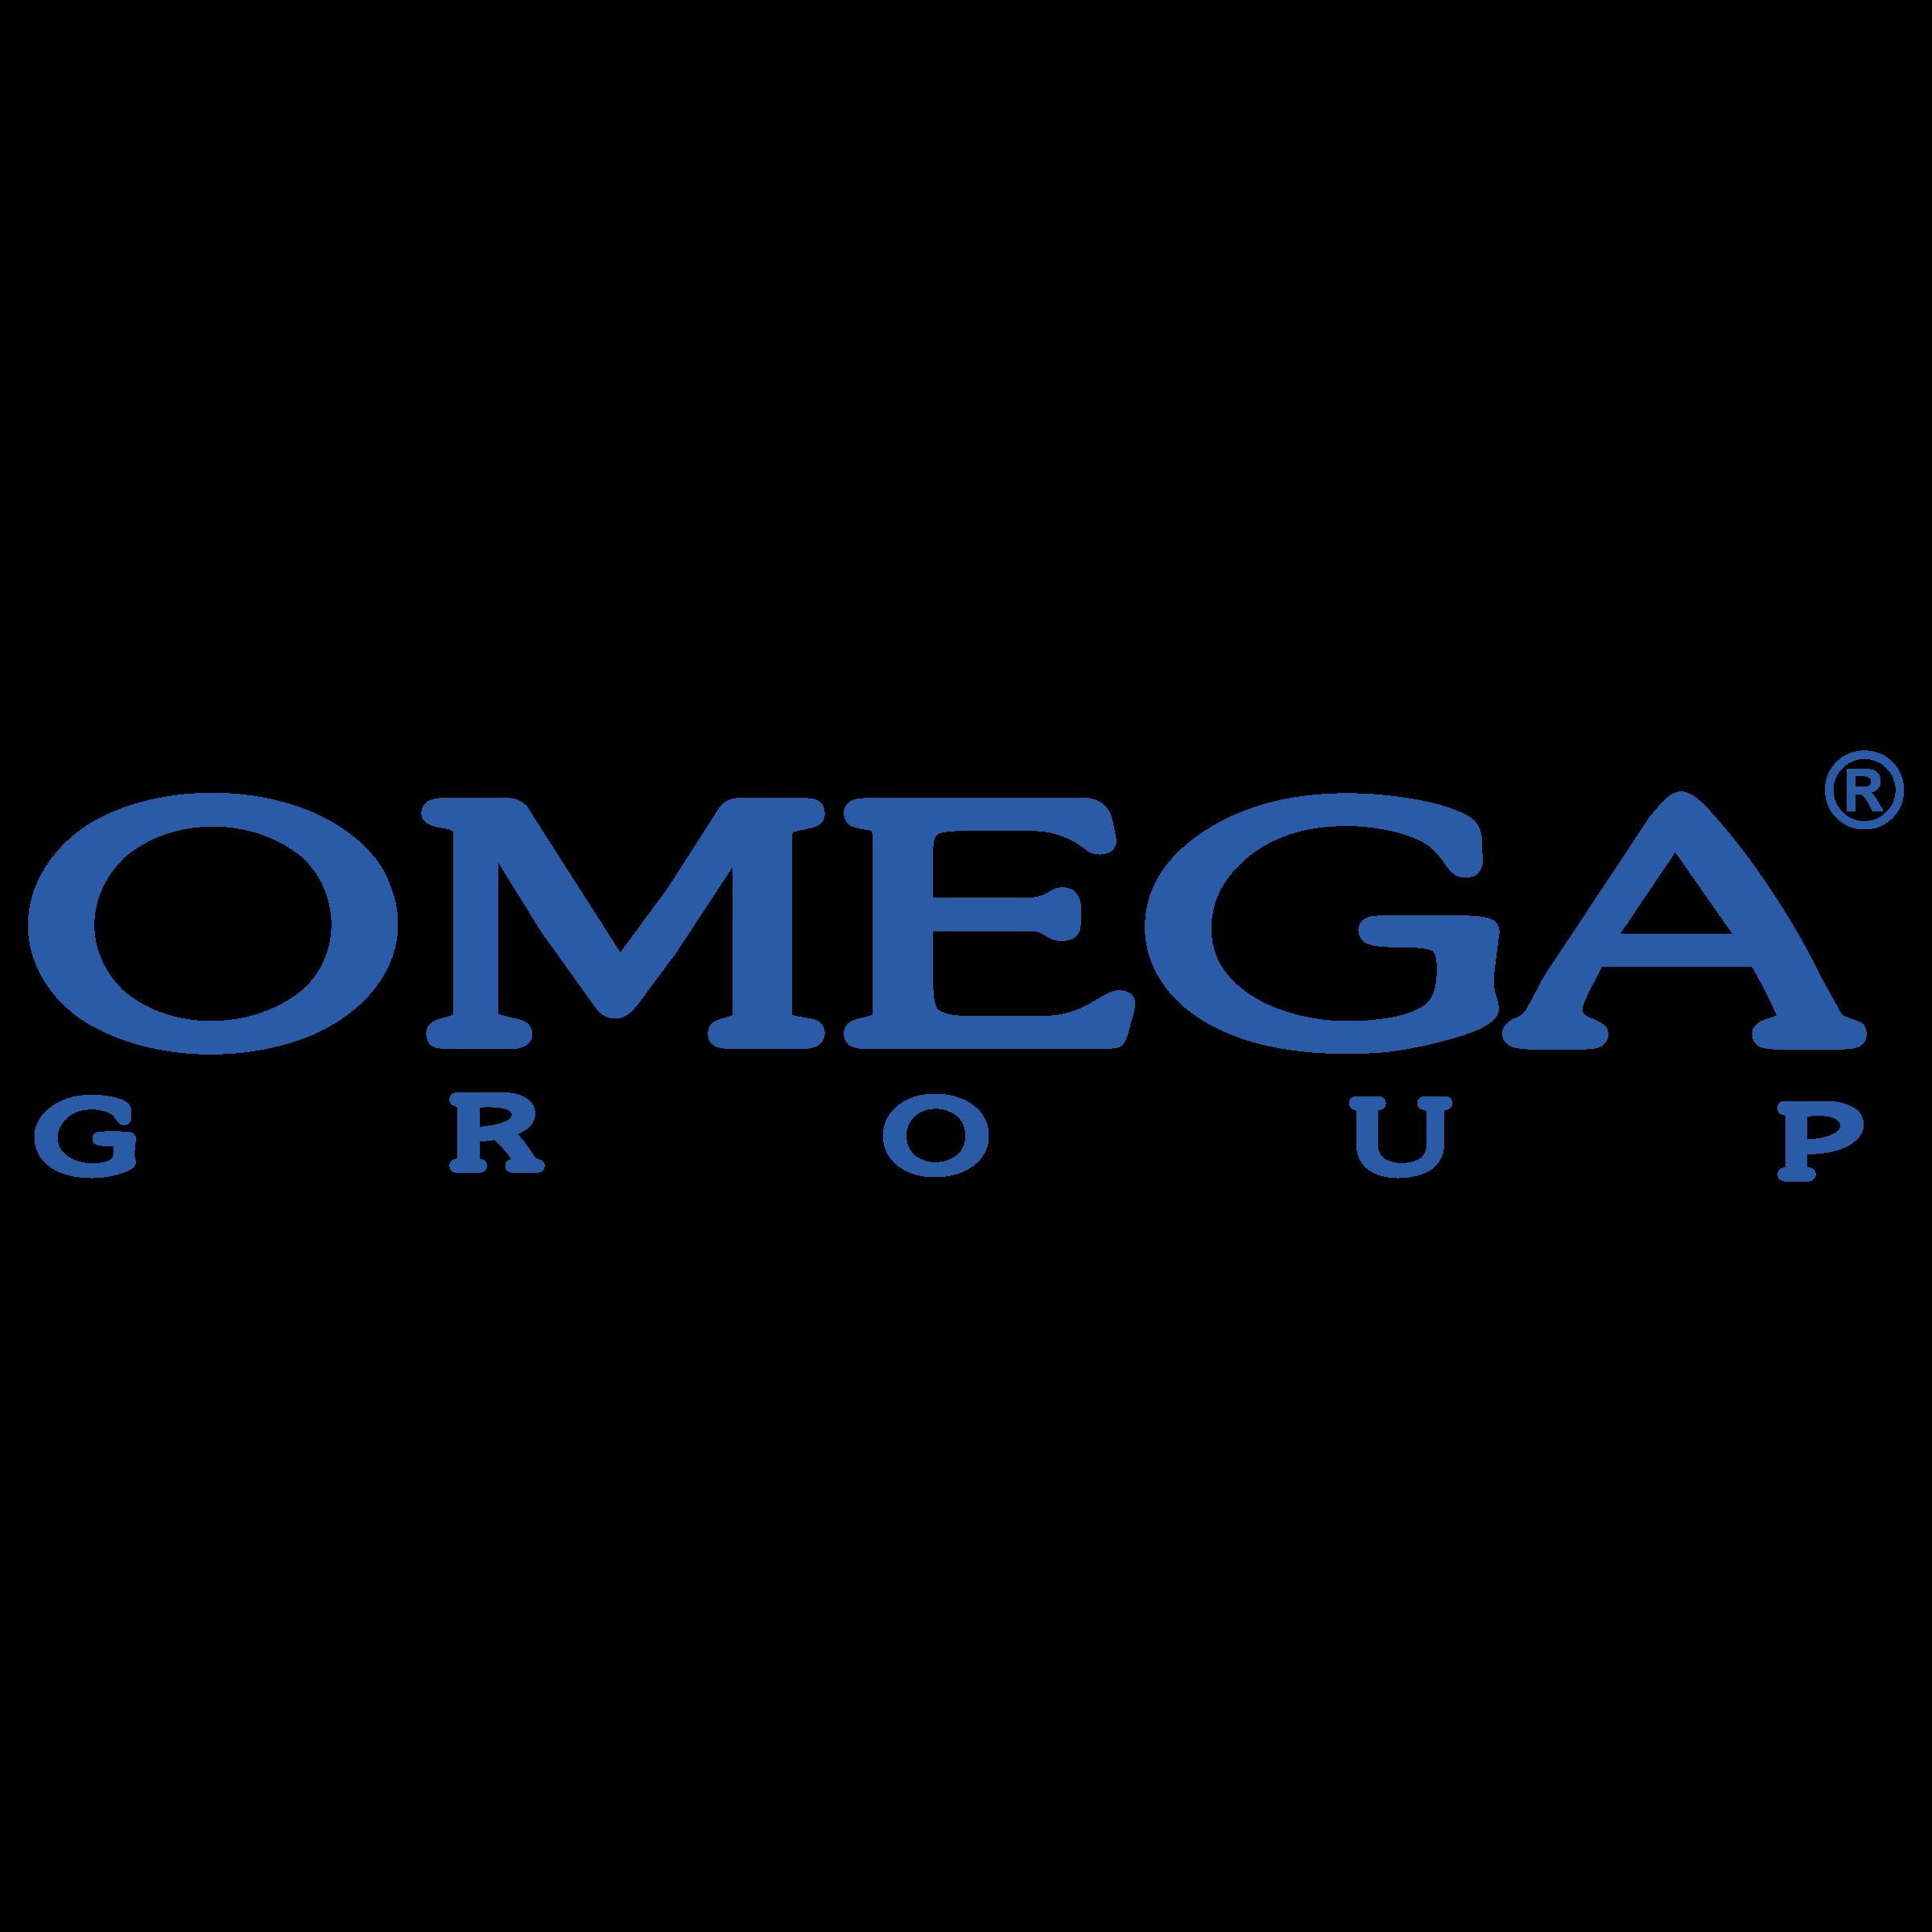 The Omega Group logo